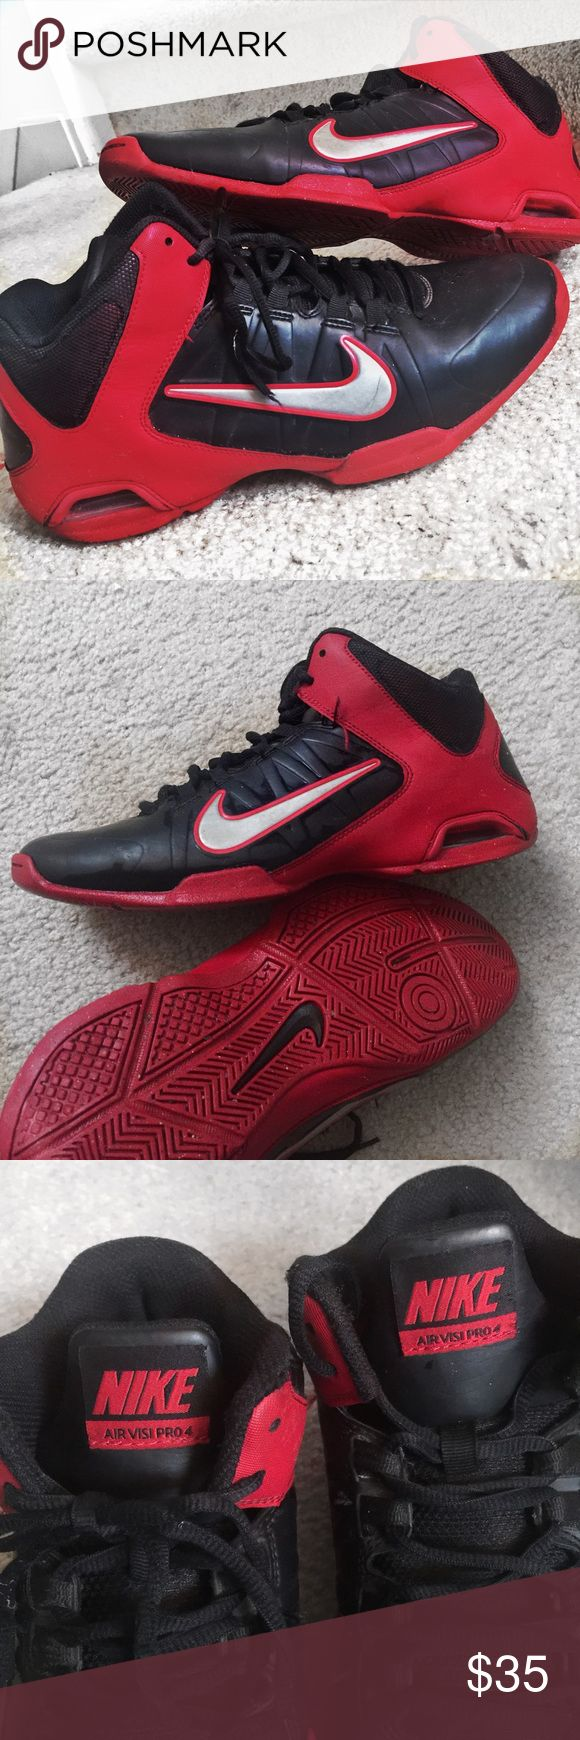 NIKE AIR VISI PRO 4 Black Red Basketball Sneakers Men's NIKE AIR VISI PRO 4 IV Black Red Basketball Sneakers Size 8.5 Nike Shoes Sneakers